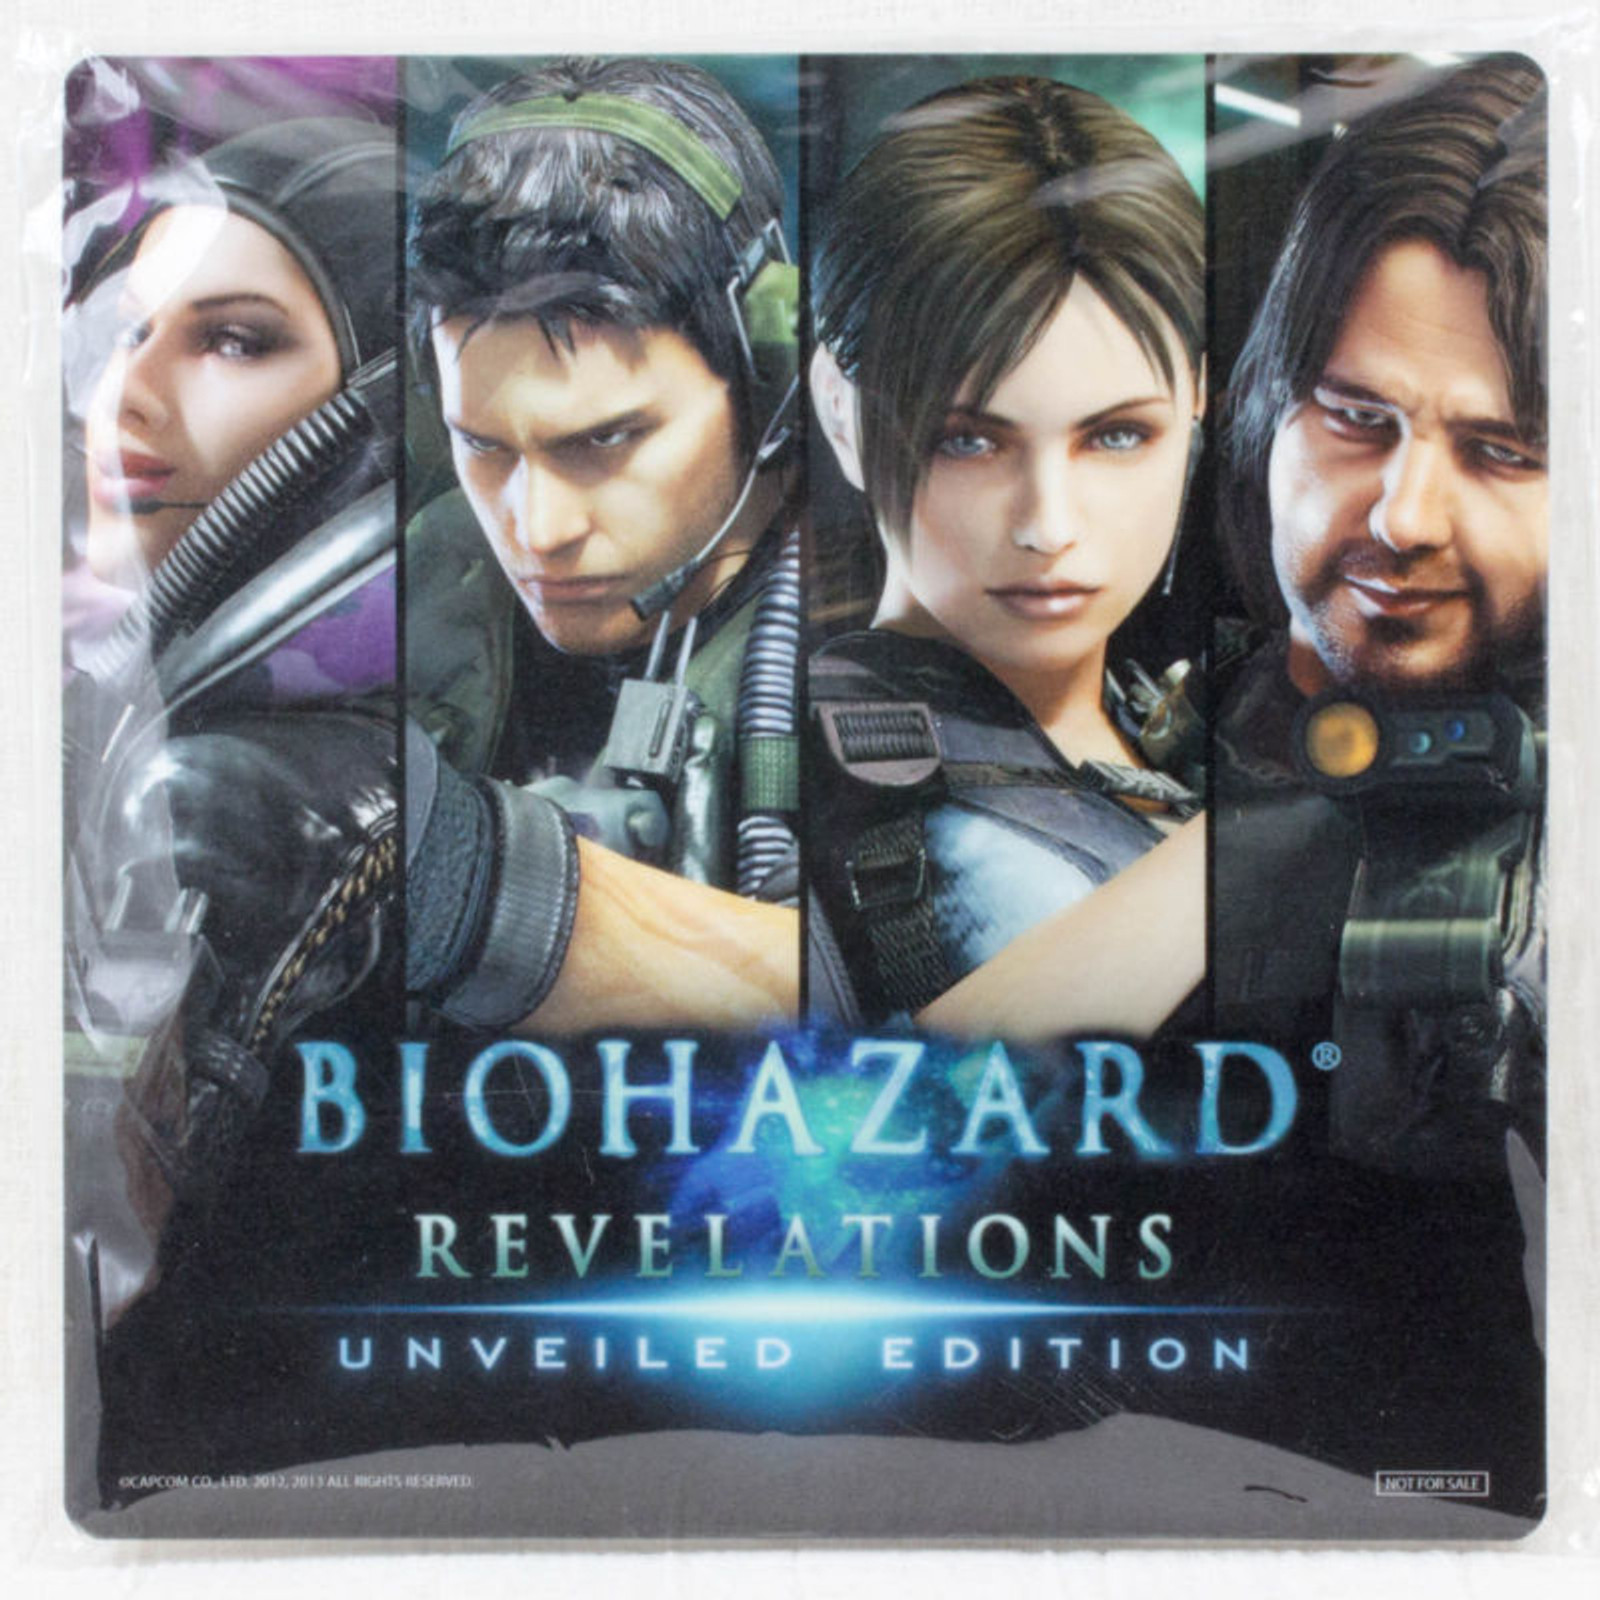 RARE Biohazard Revelations Mouse Pad Limted Item Capcom JAPAN GAME Resident Evil